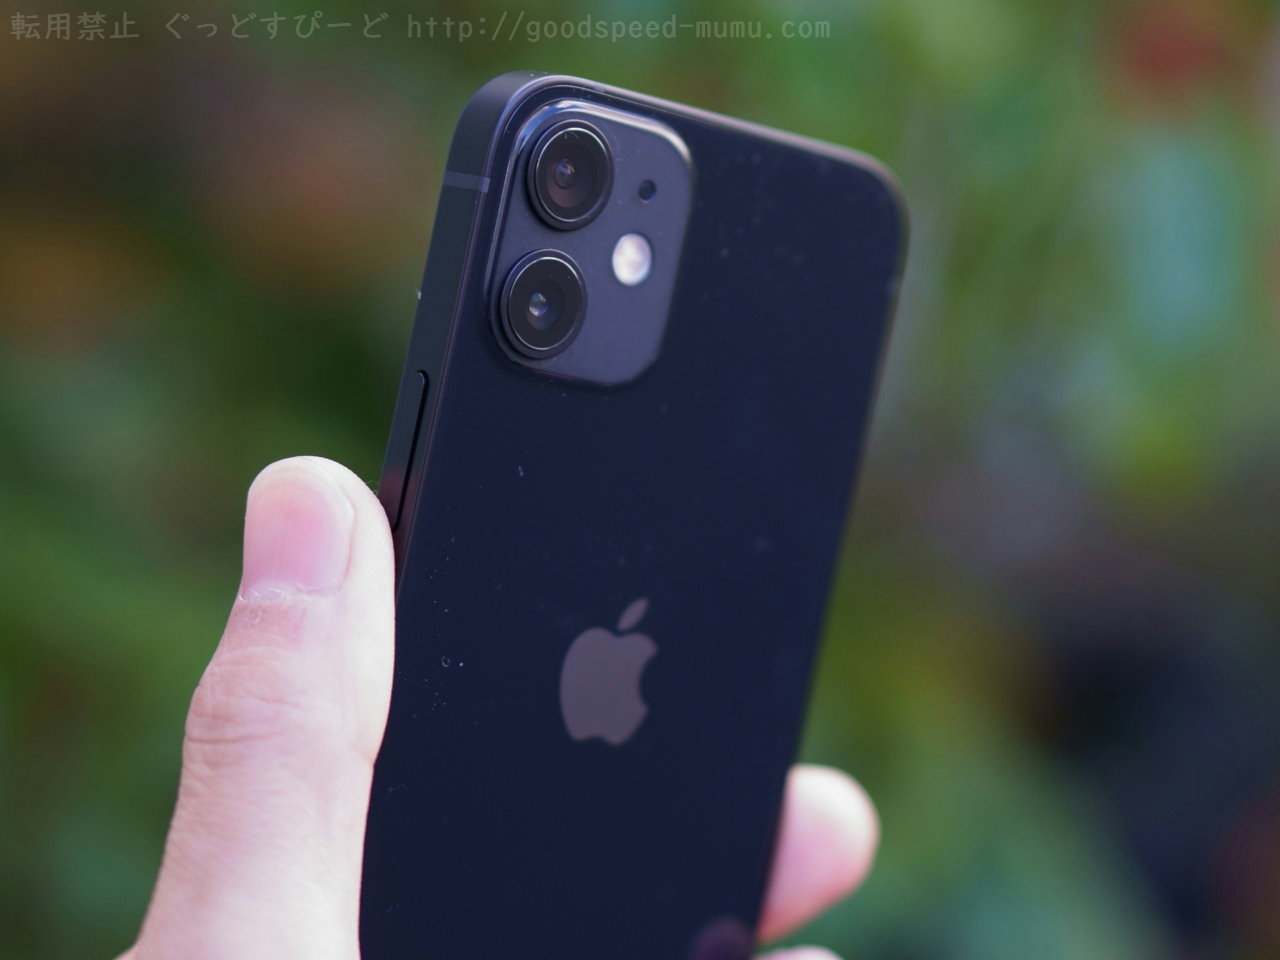 iPhone12mini購入 4日間使った感想を書いてみる